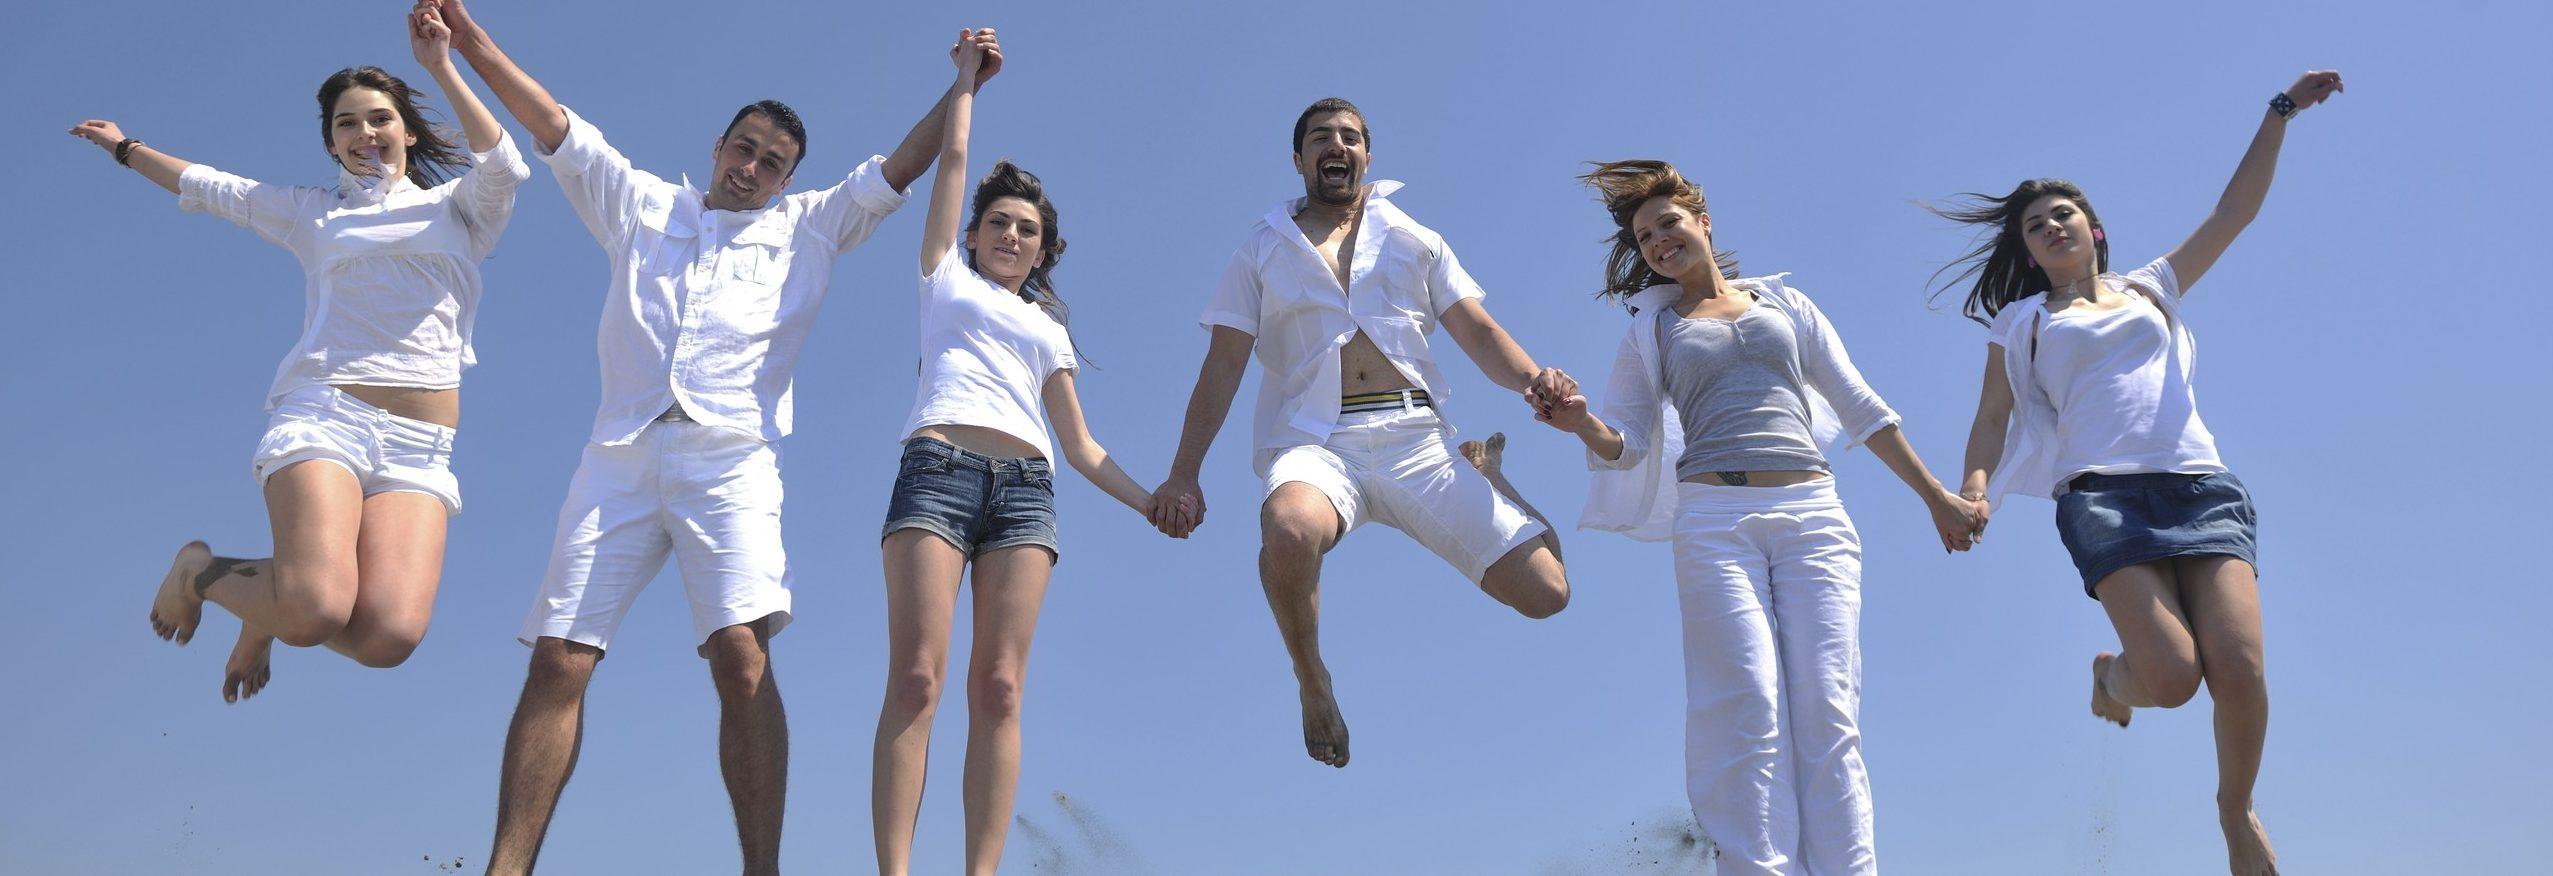 Jumping-e1484302303525